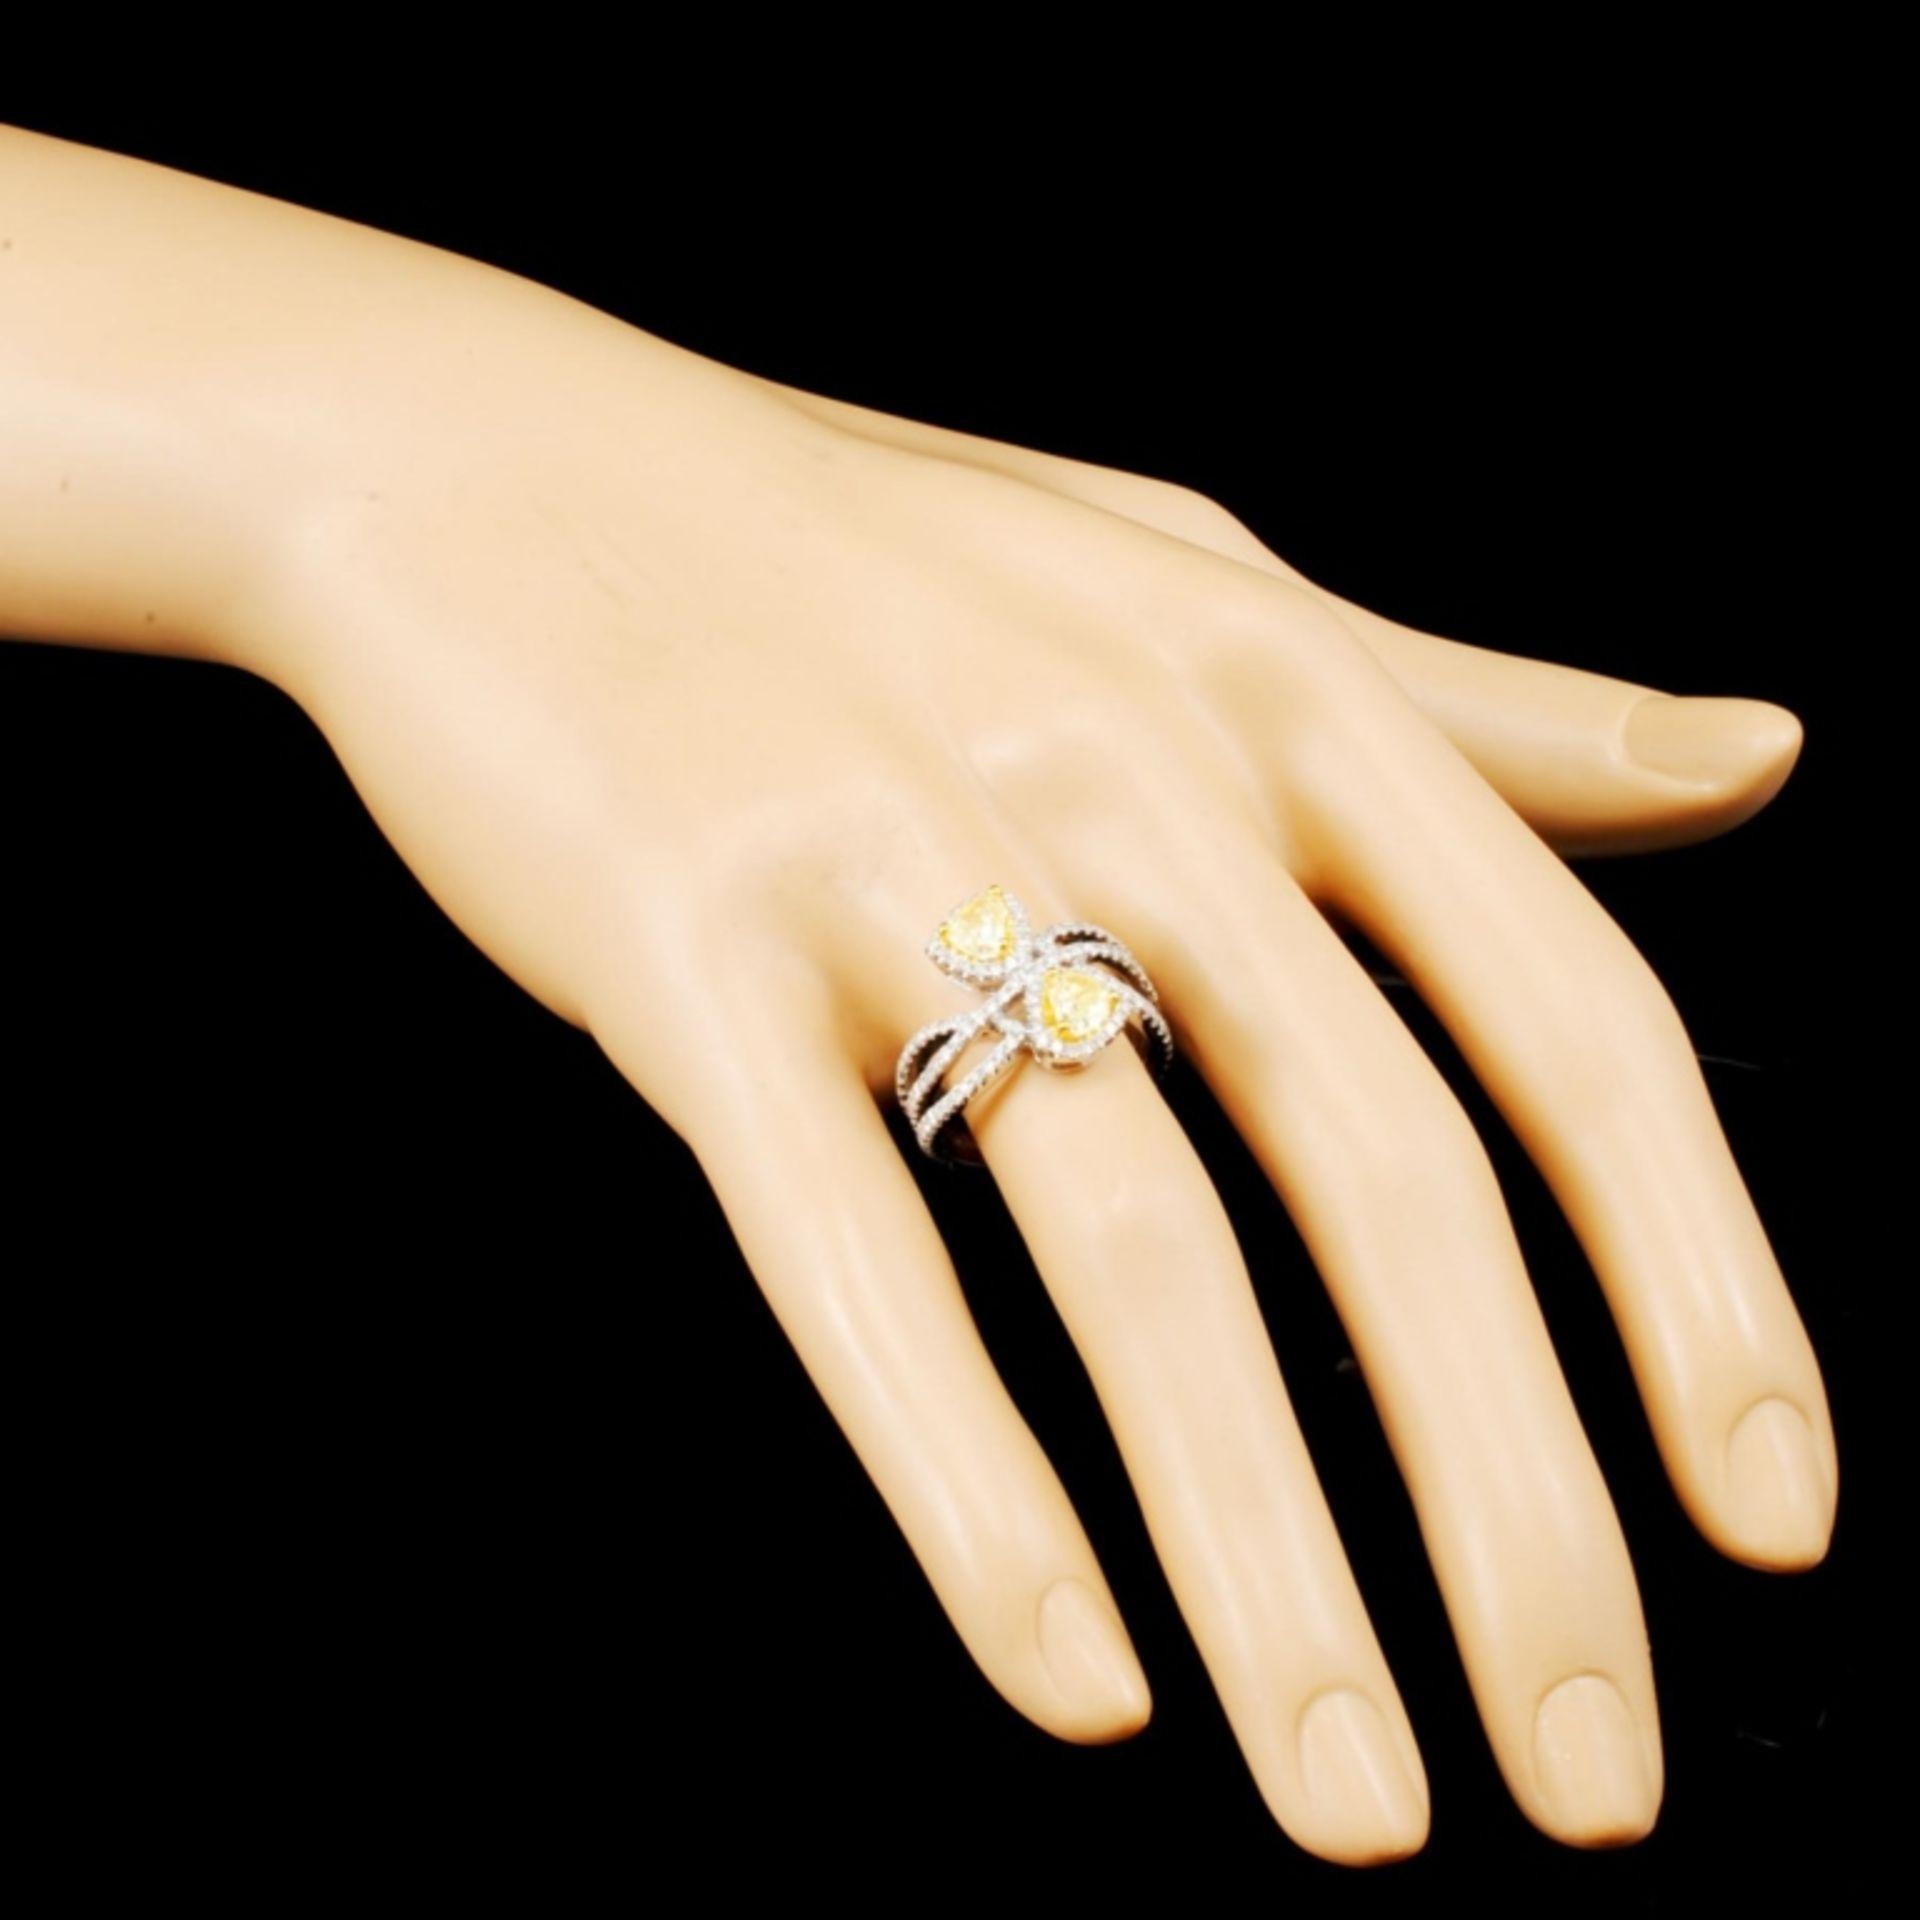 18K Gold 1.96ctw Diamond Ring - Image 3 of 5